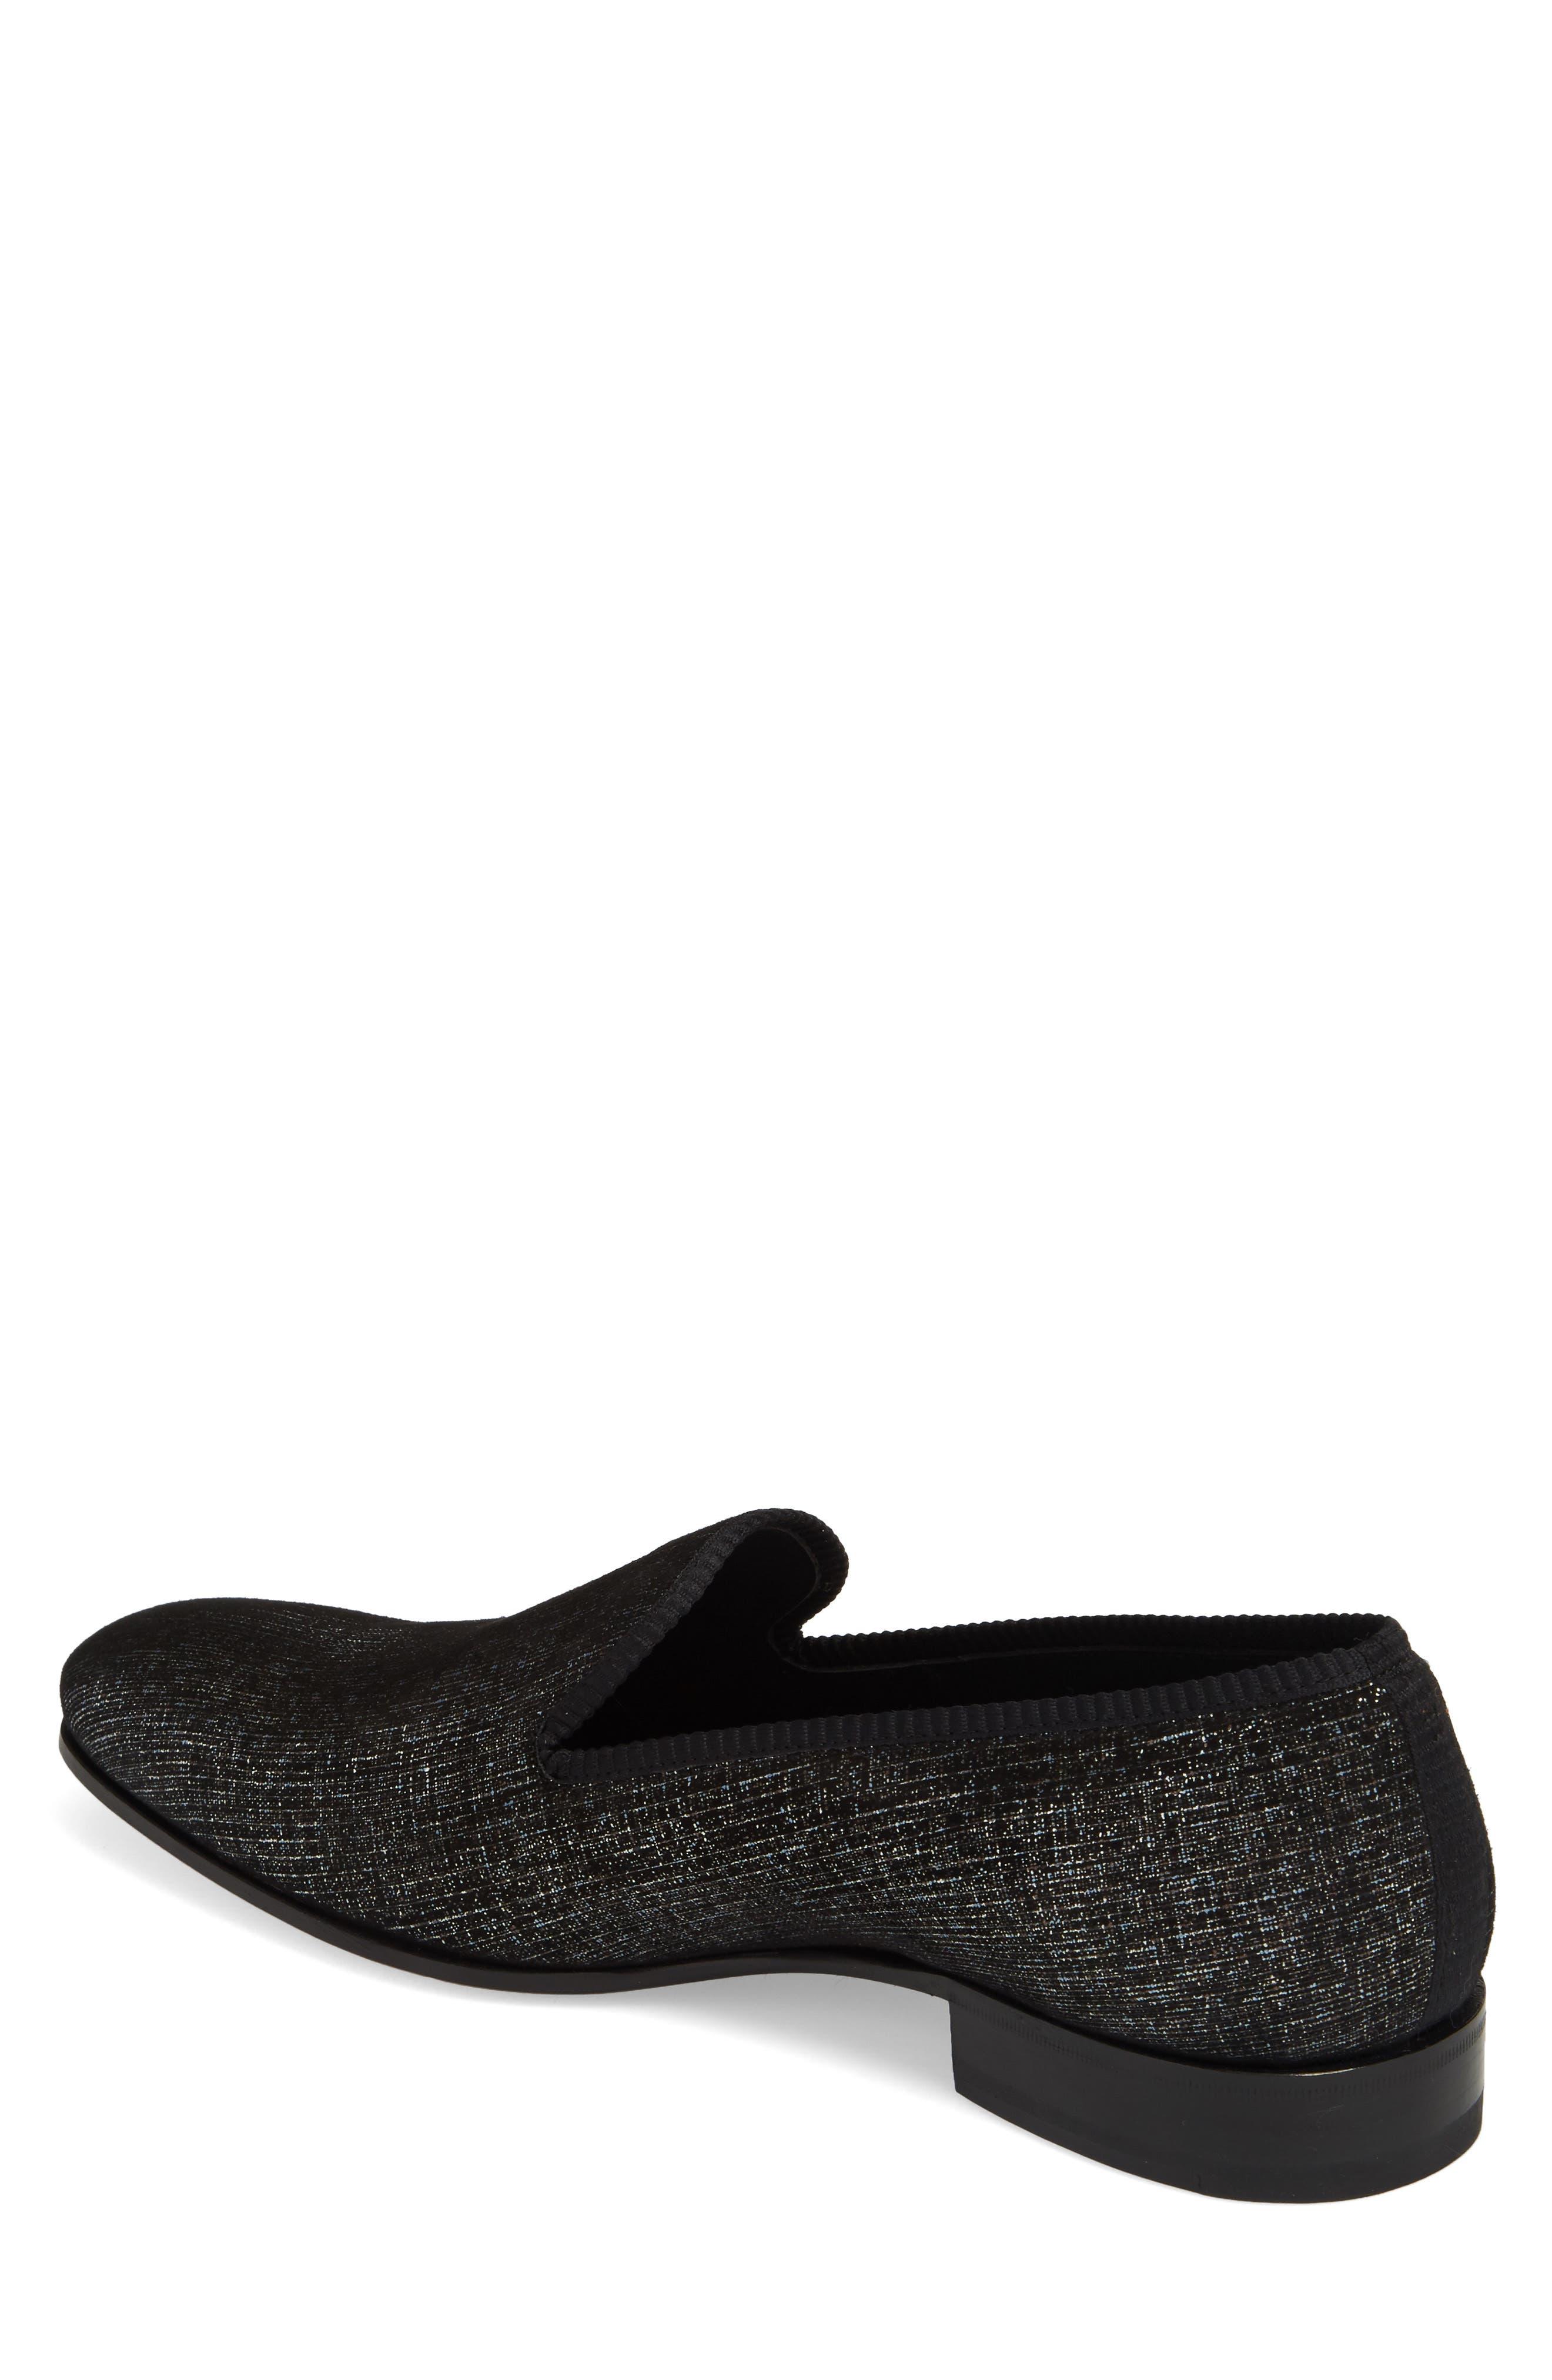 Belona Venetian Loafer,                             Alternate thumbnail 2, color,                             GREY SUEDE